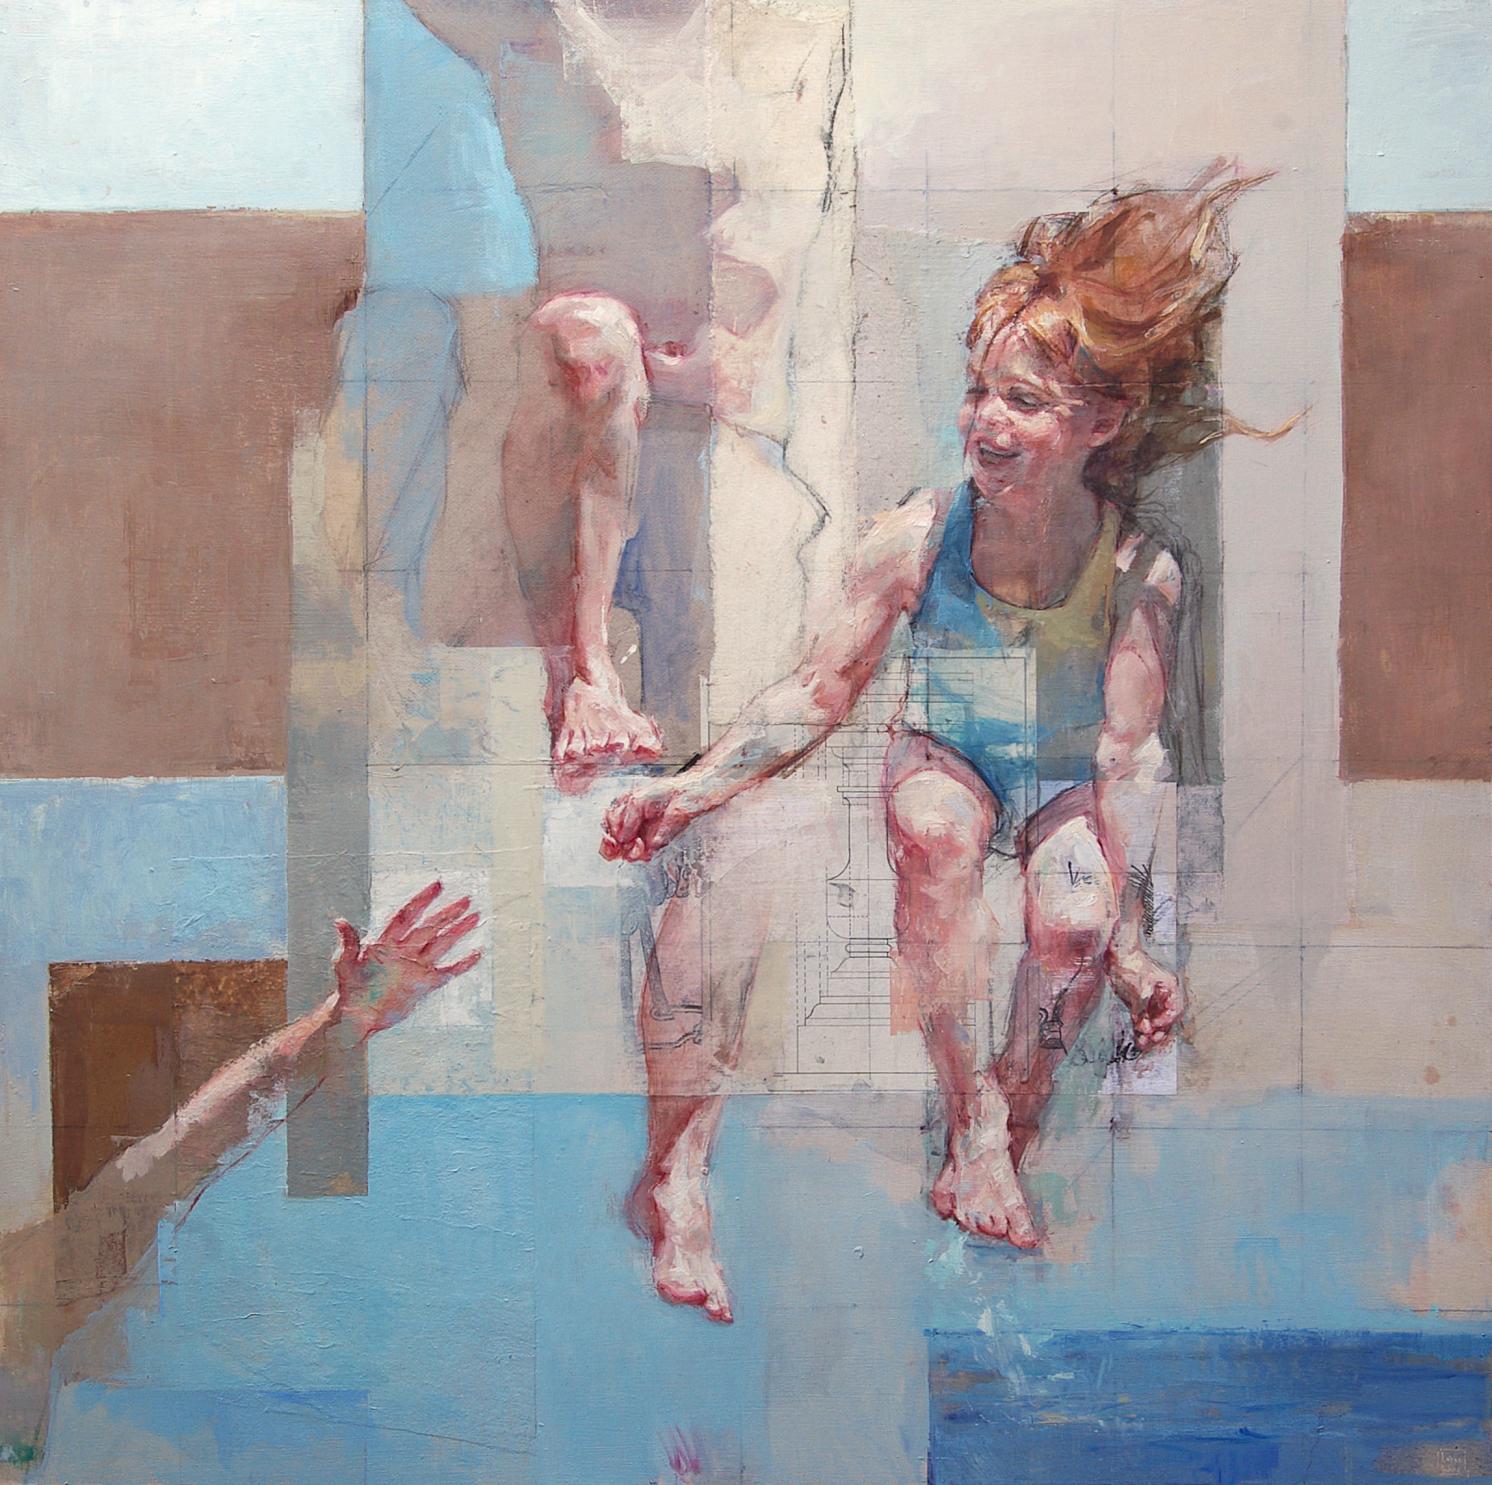 La alegría de vivir (2017) - Pilar López Báez